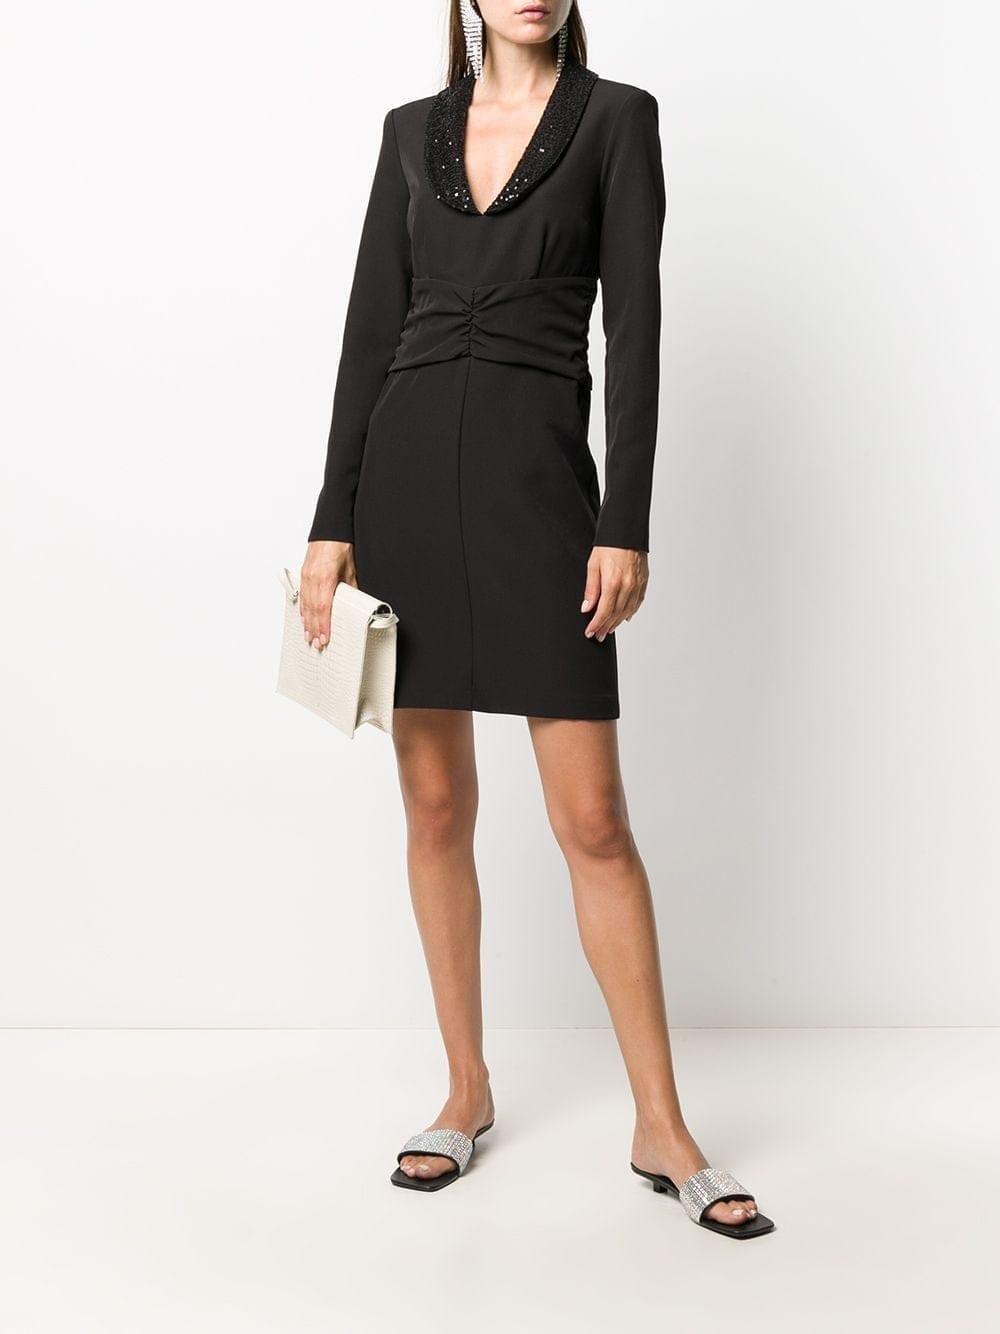 BLUMARINE Embellished Collar Mini Dress